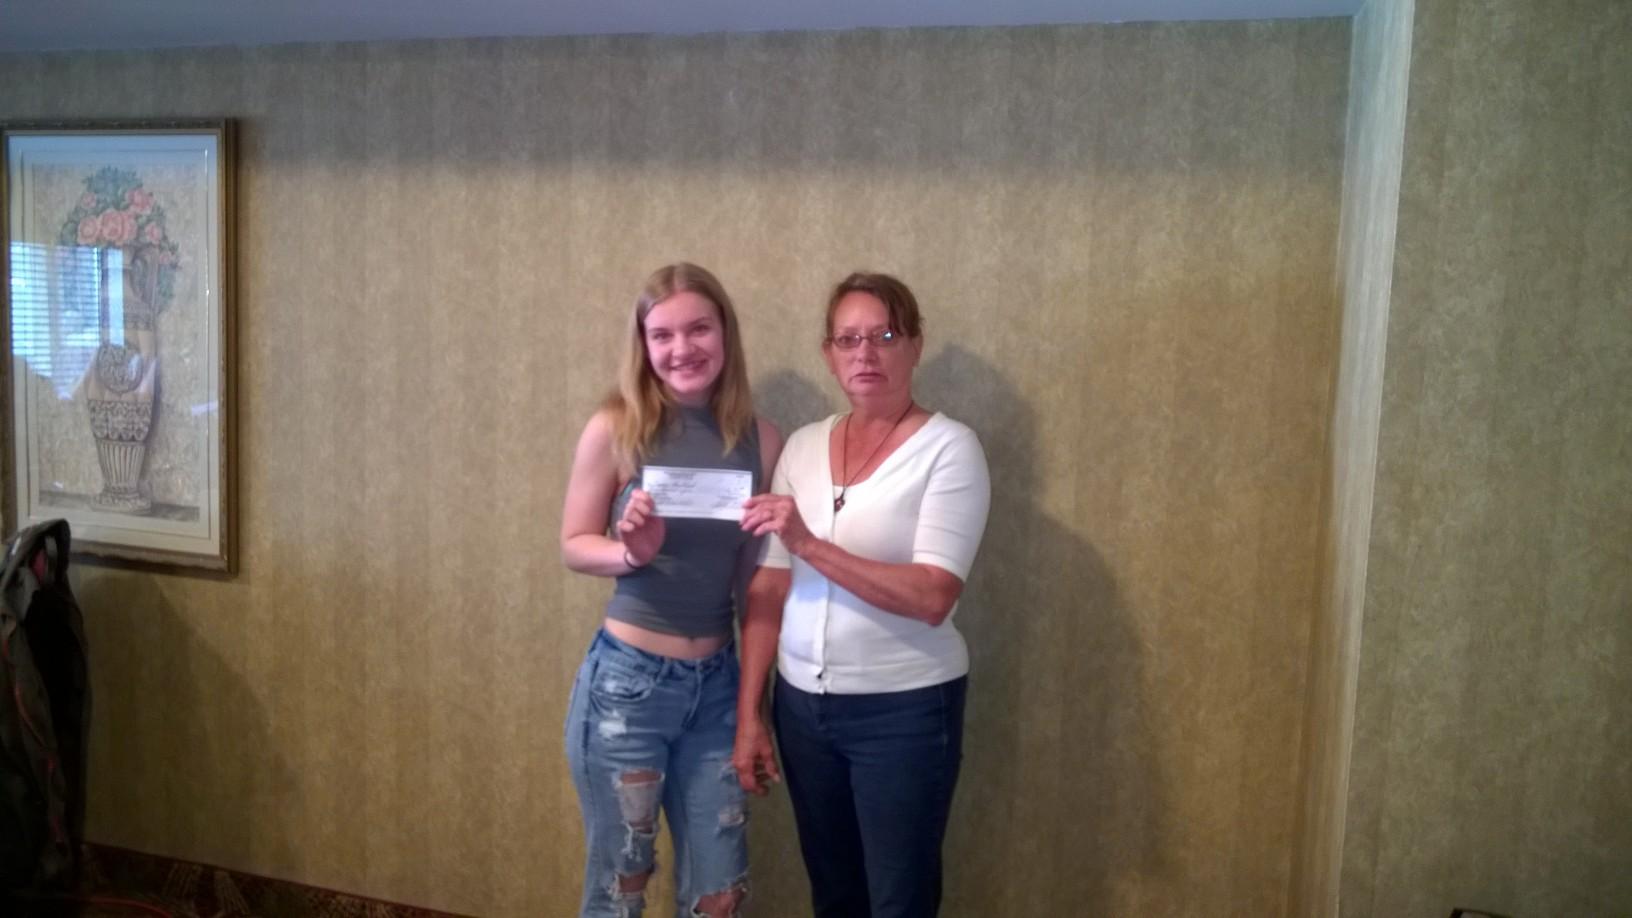 Driver Education Class Winner